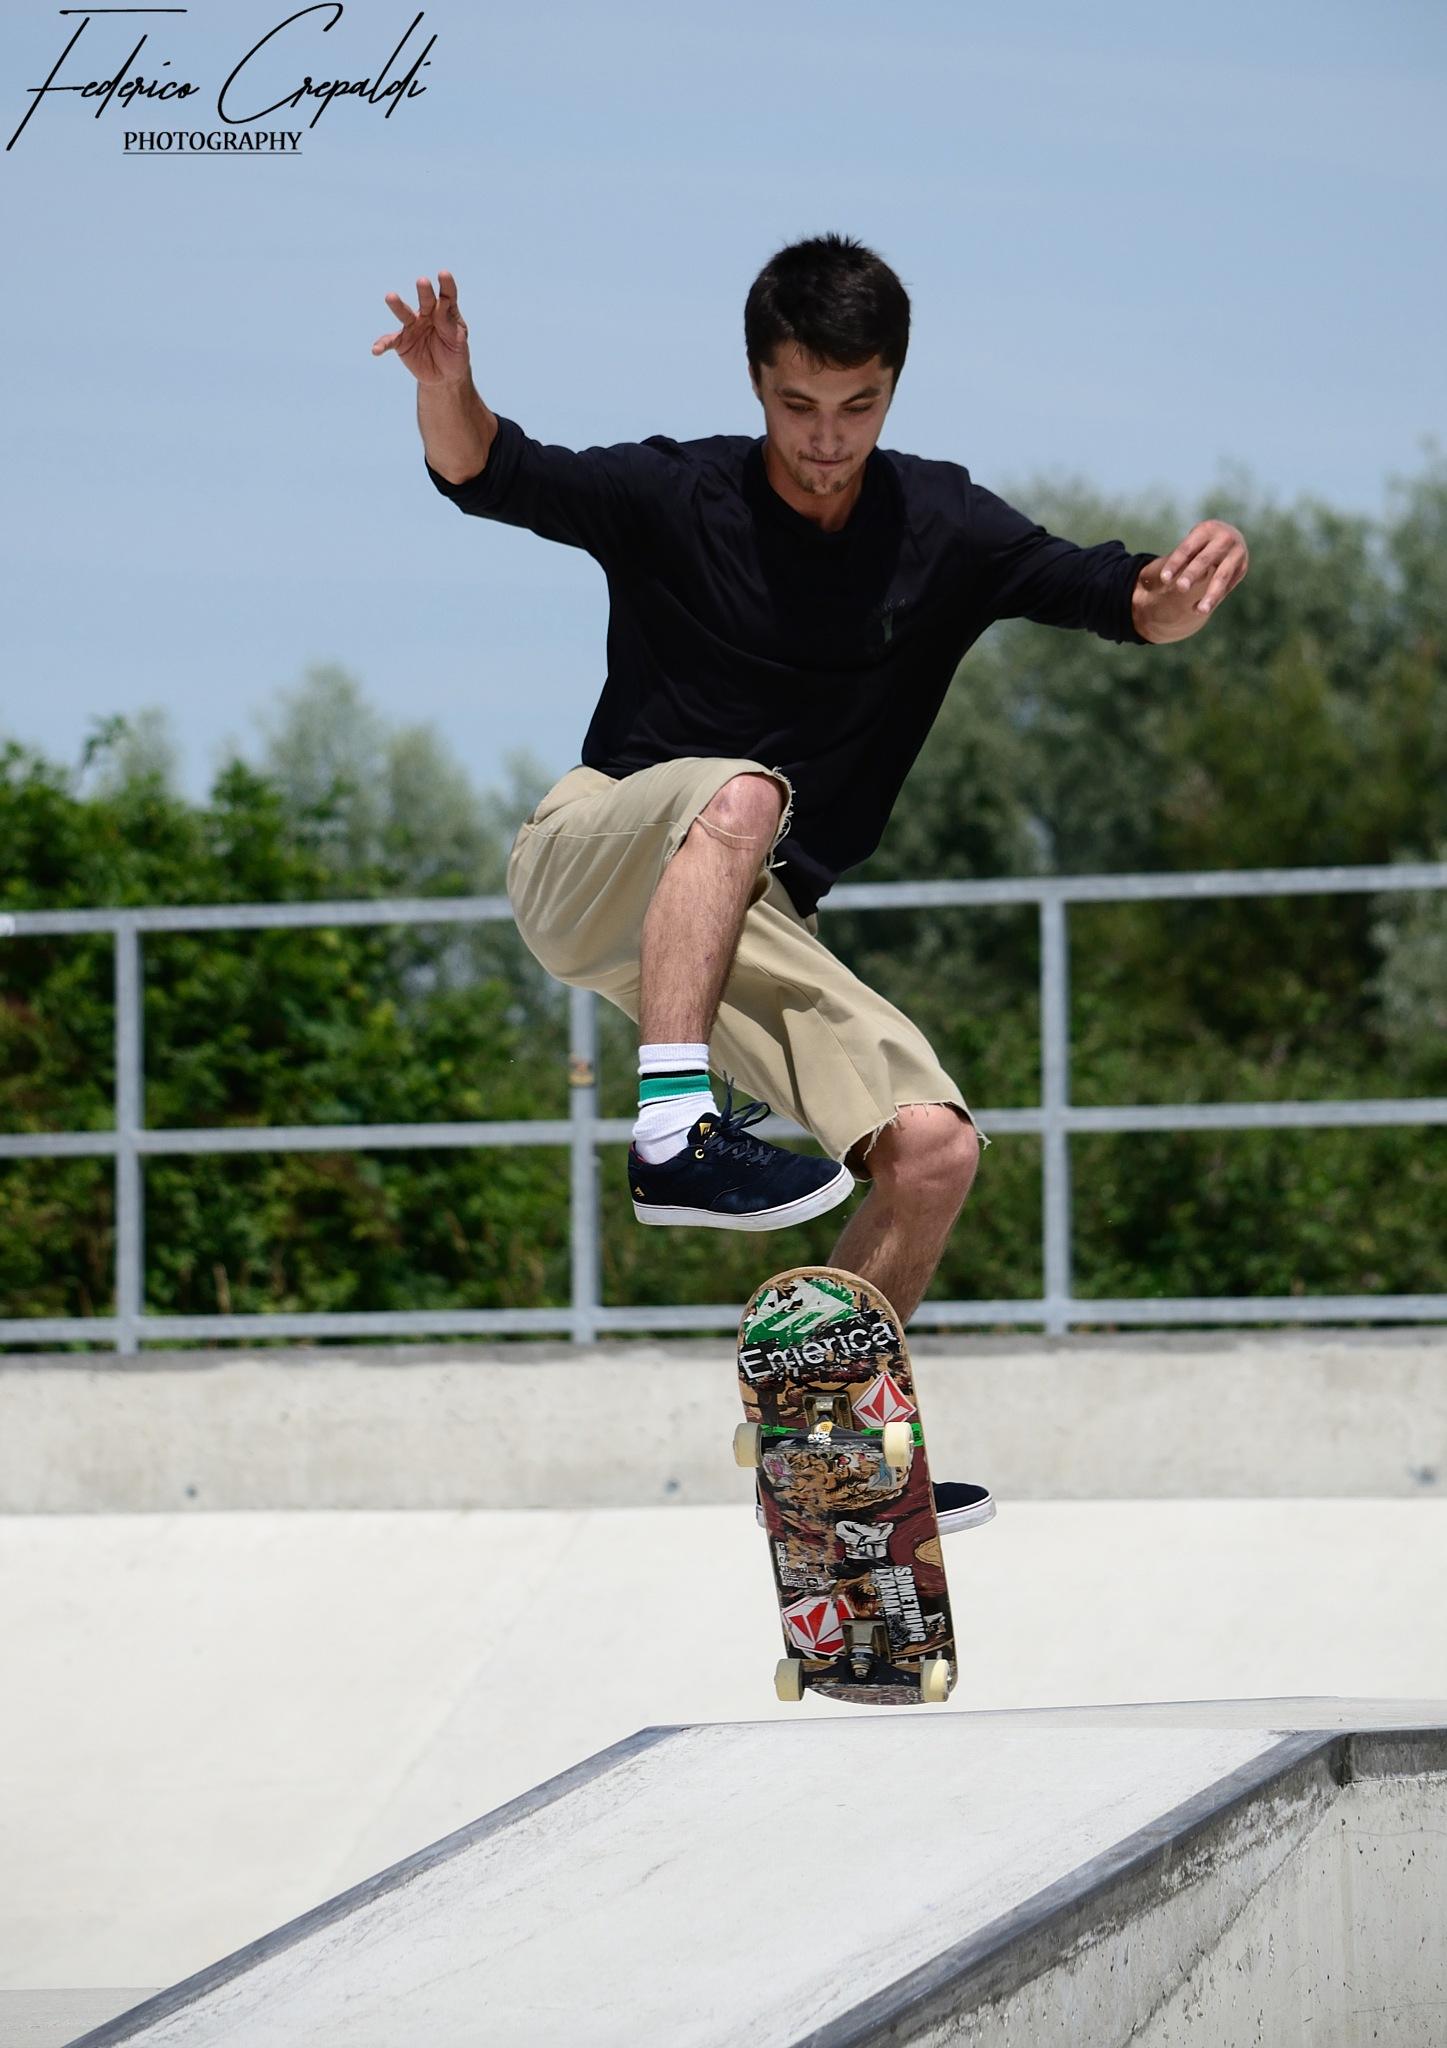 Skate 3 by Federico Crepaldi